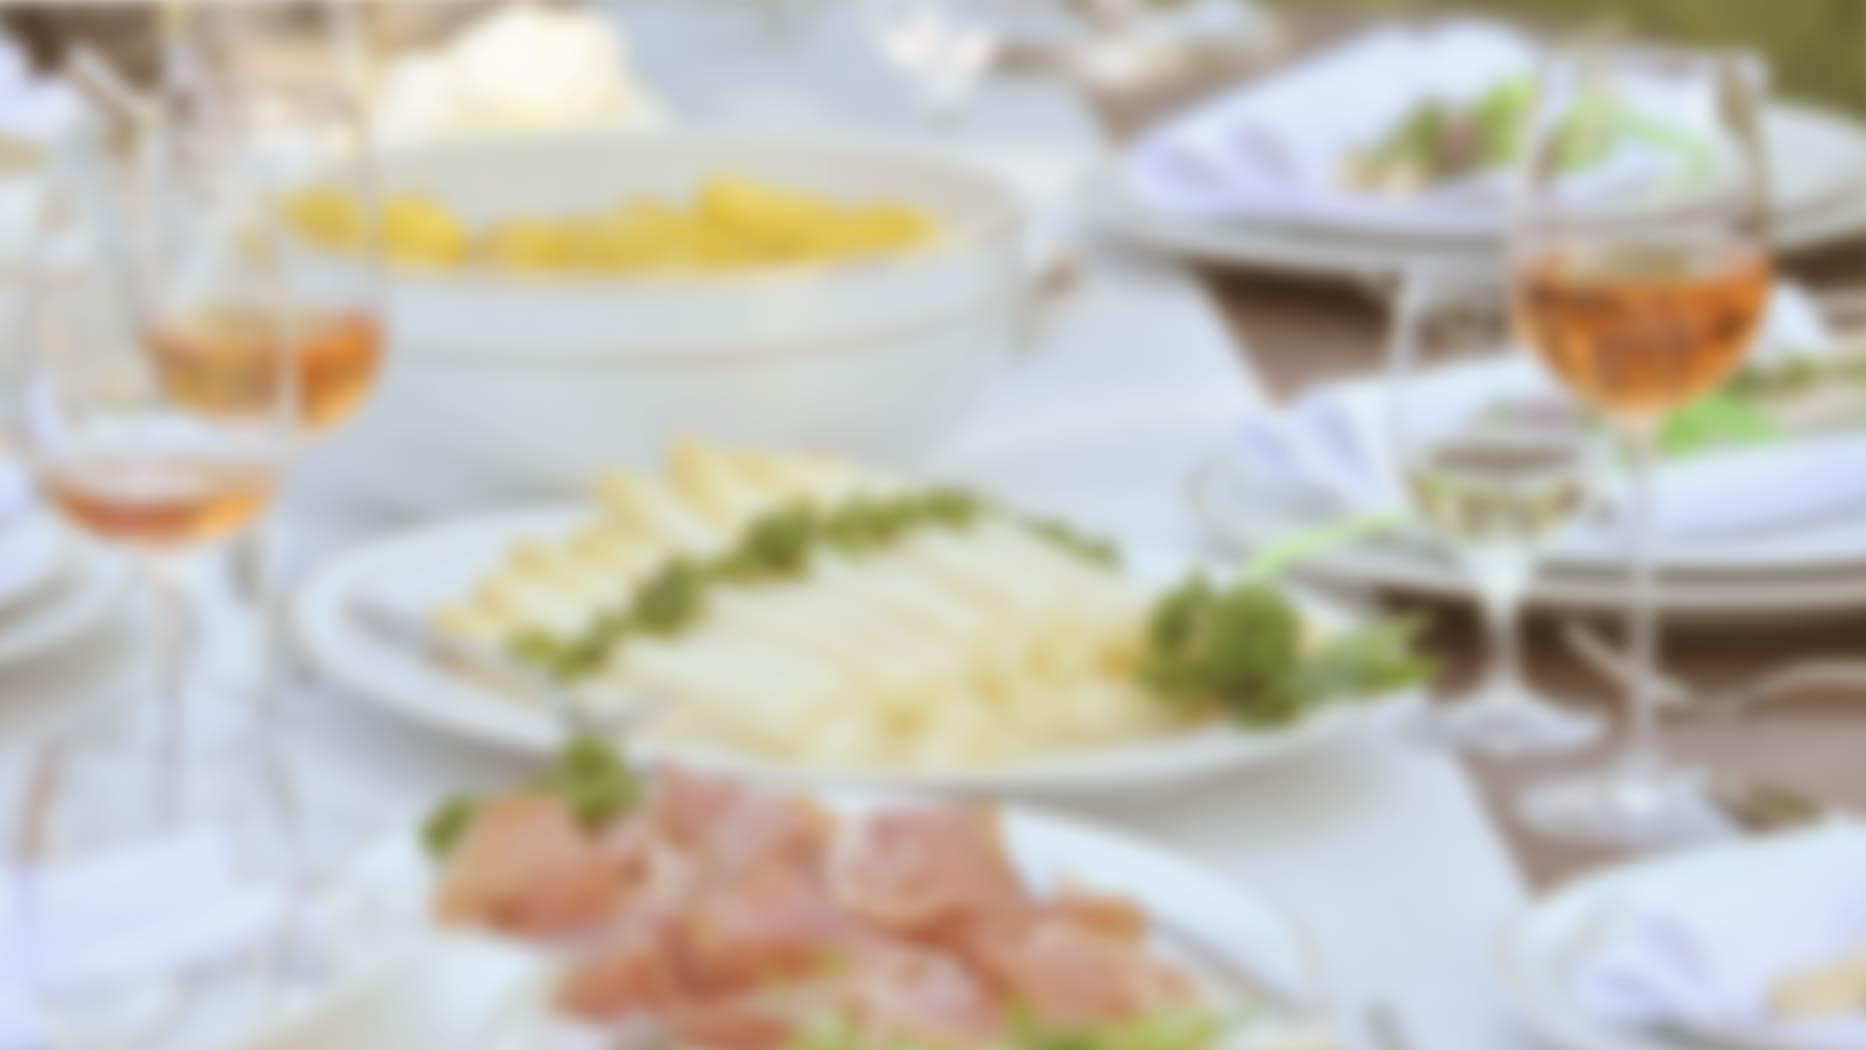 Speisekarte – Spargelsaison